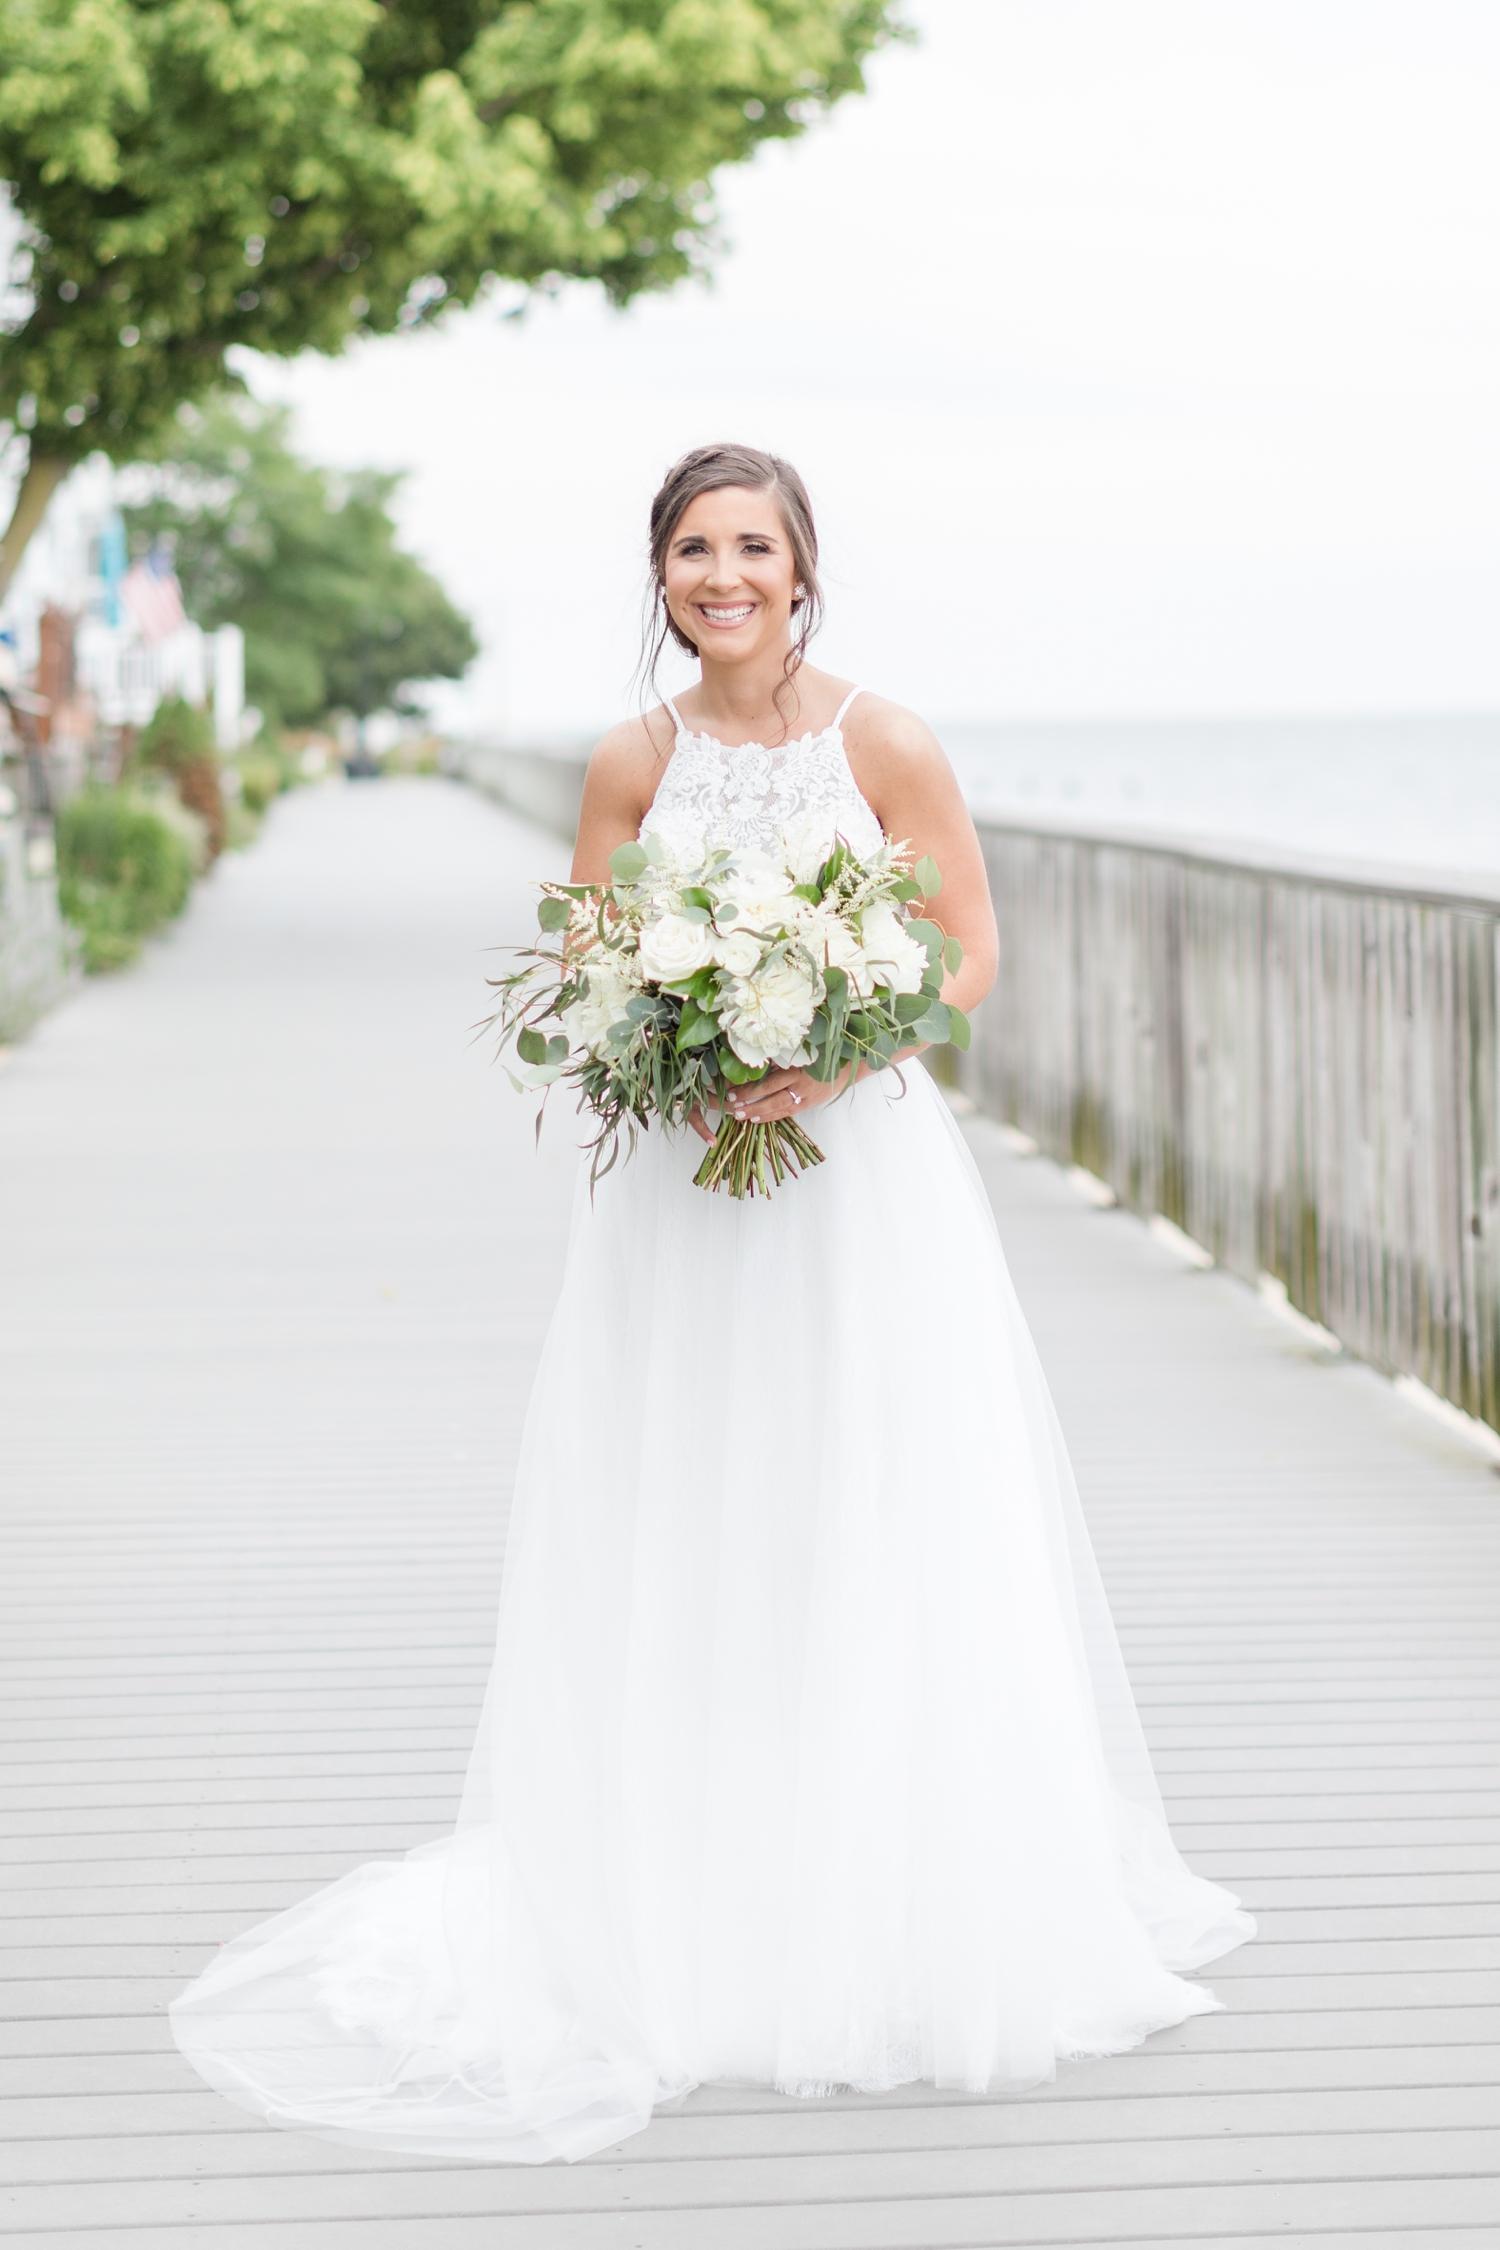 Schindler WEDDING HIGHLIGHTS-83_Herrington-on-the-Bay-wedding-Maryland-wedding-photographer-anna-grace-photography-photo.jpg